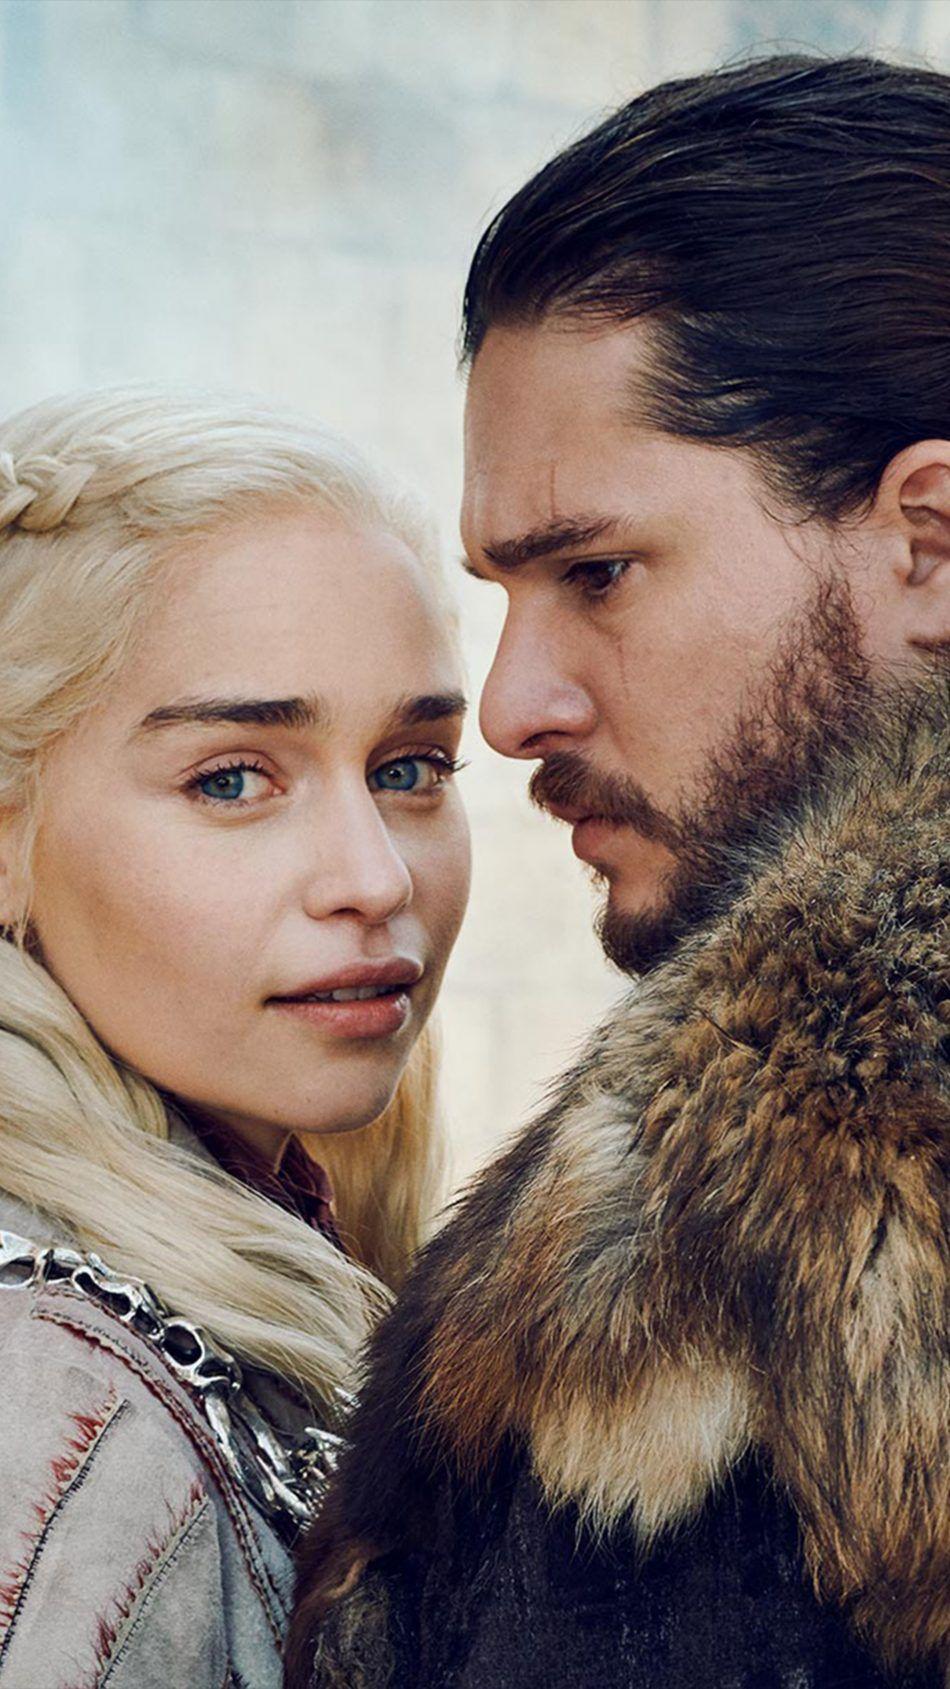 Daenerys Targaryen Jon Snow Game Of Thrones S8 4k Ultra Hd Mobile Wallpaper Snow Wallpaper Iphone Jon Snow Aesthetic Snow Wallpaper Hd